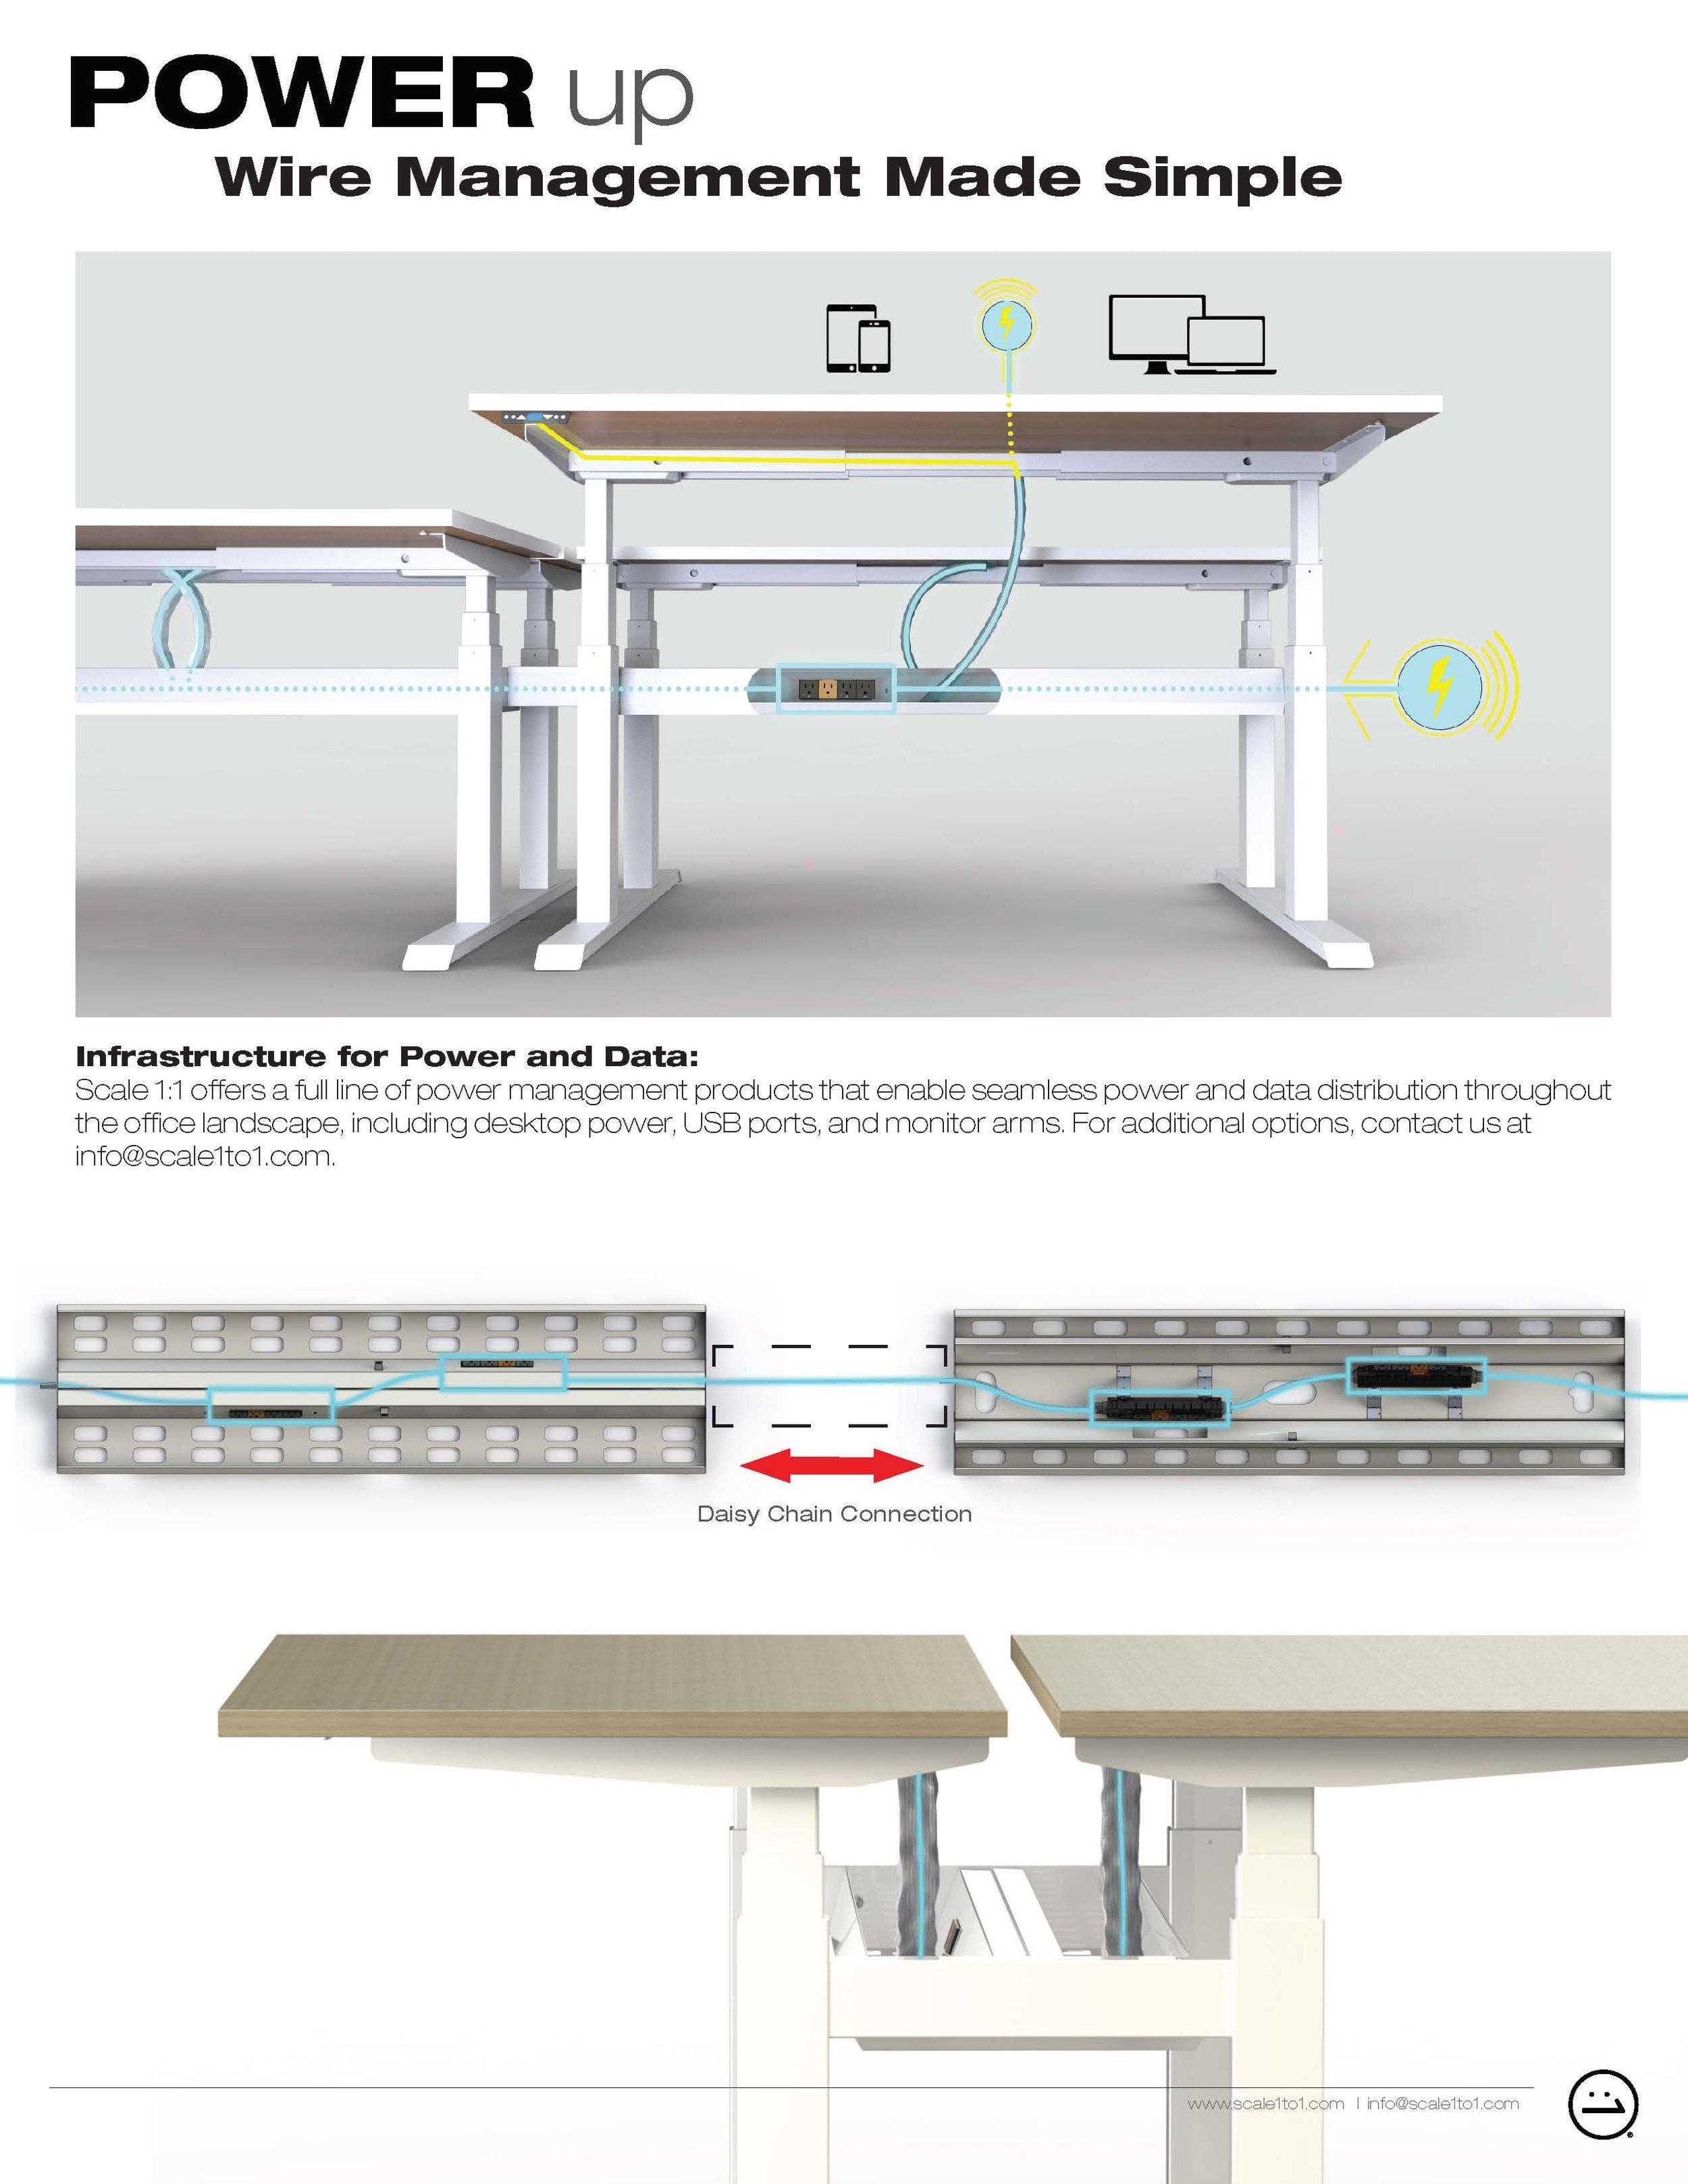 wiiRise Height Adjustable Desks Power Up Wire Management